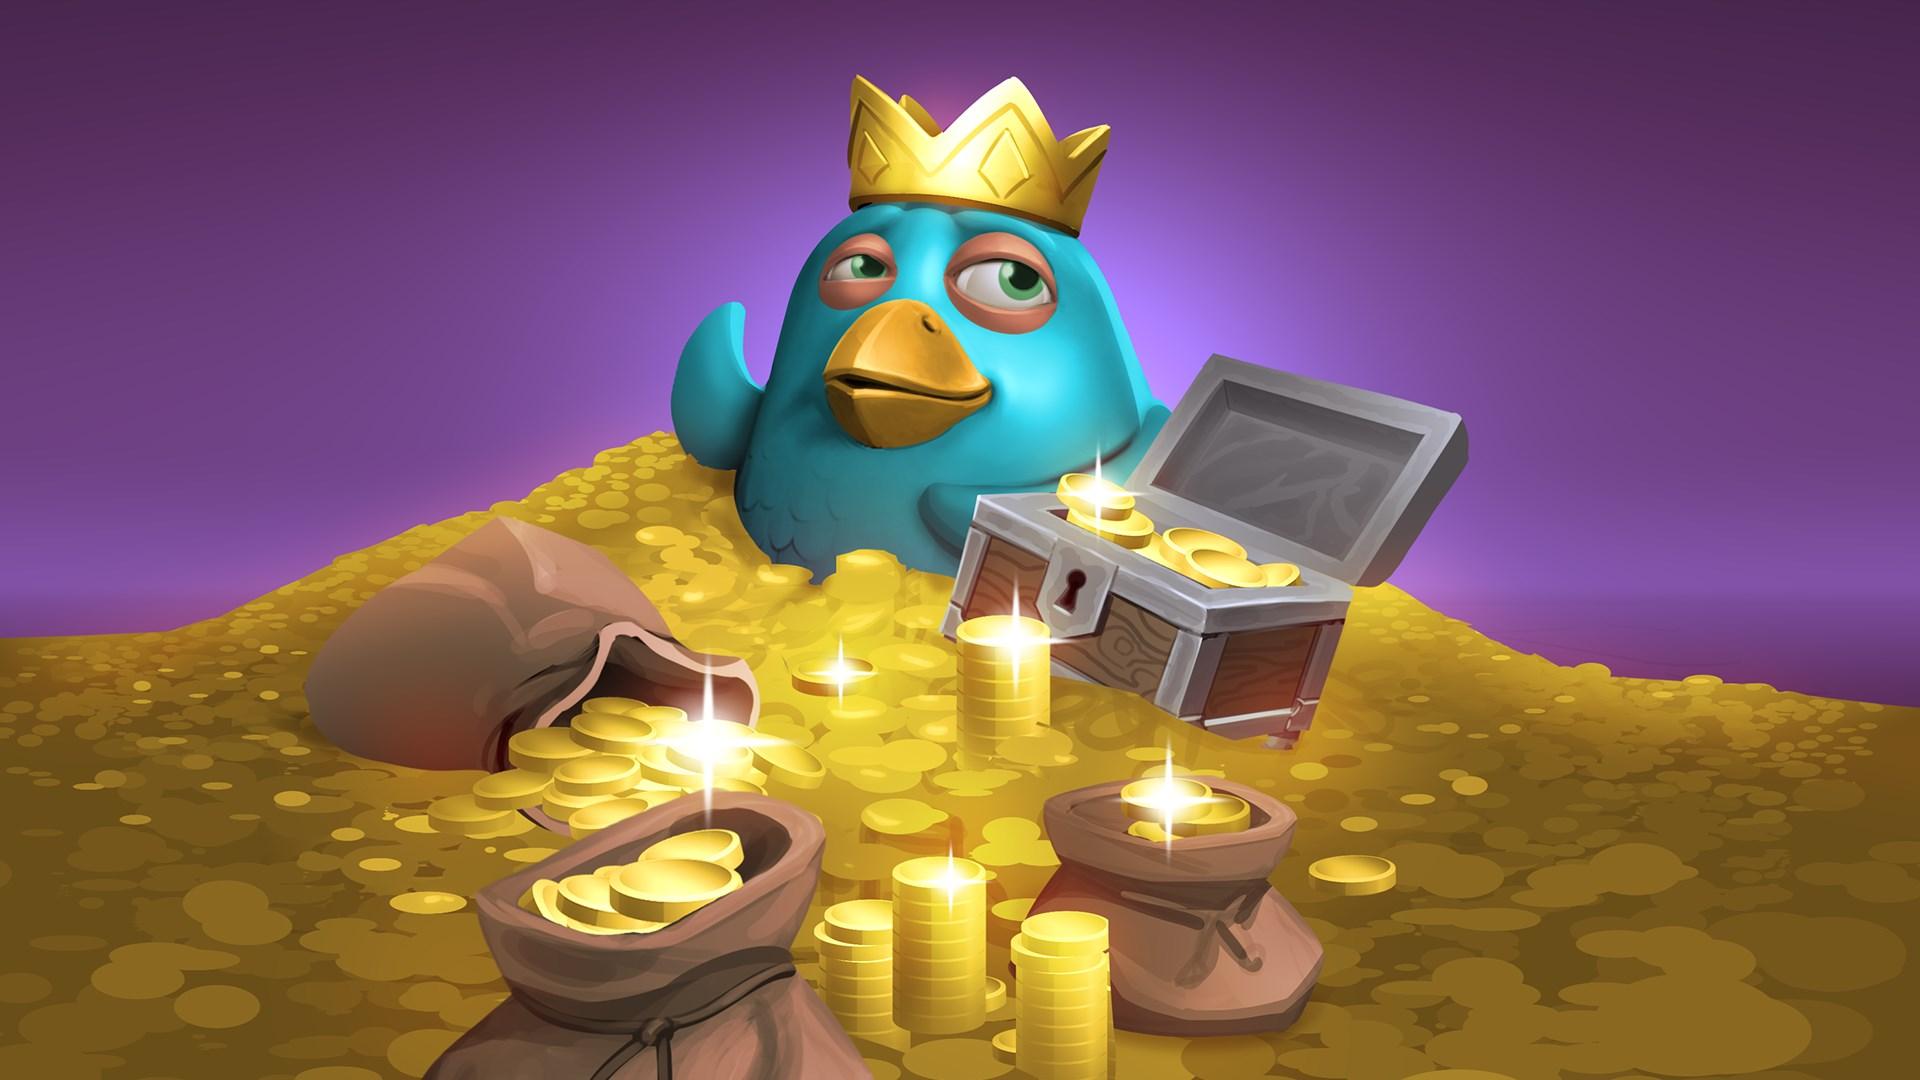 Buy 6,500 Realm Royale Crowns - Microsoft Store en-AU